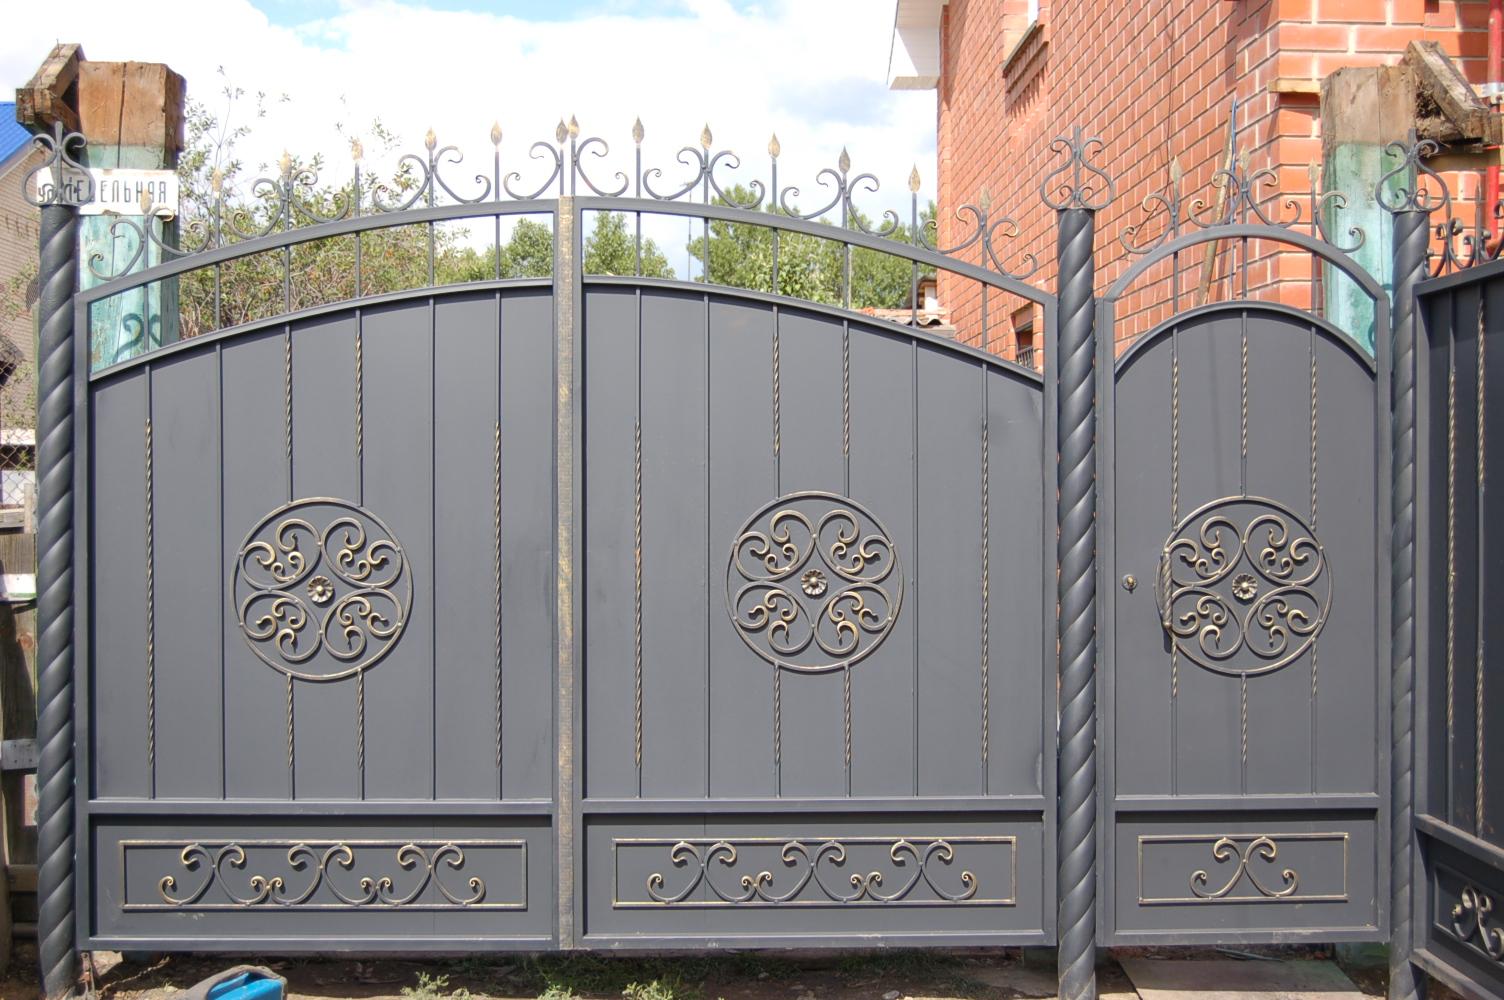 Узоры на воротах своими руками фото